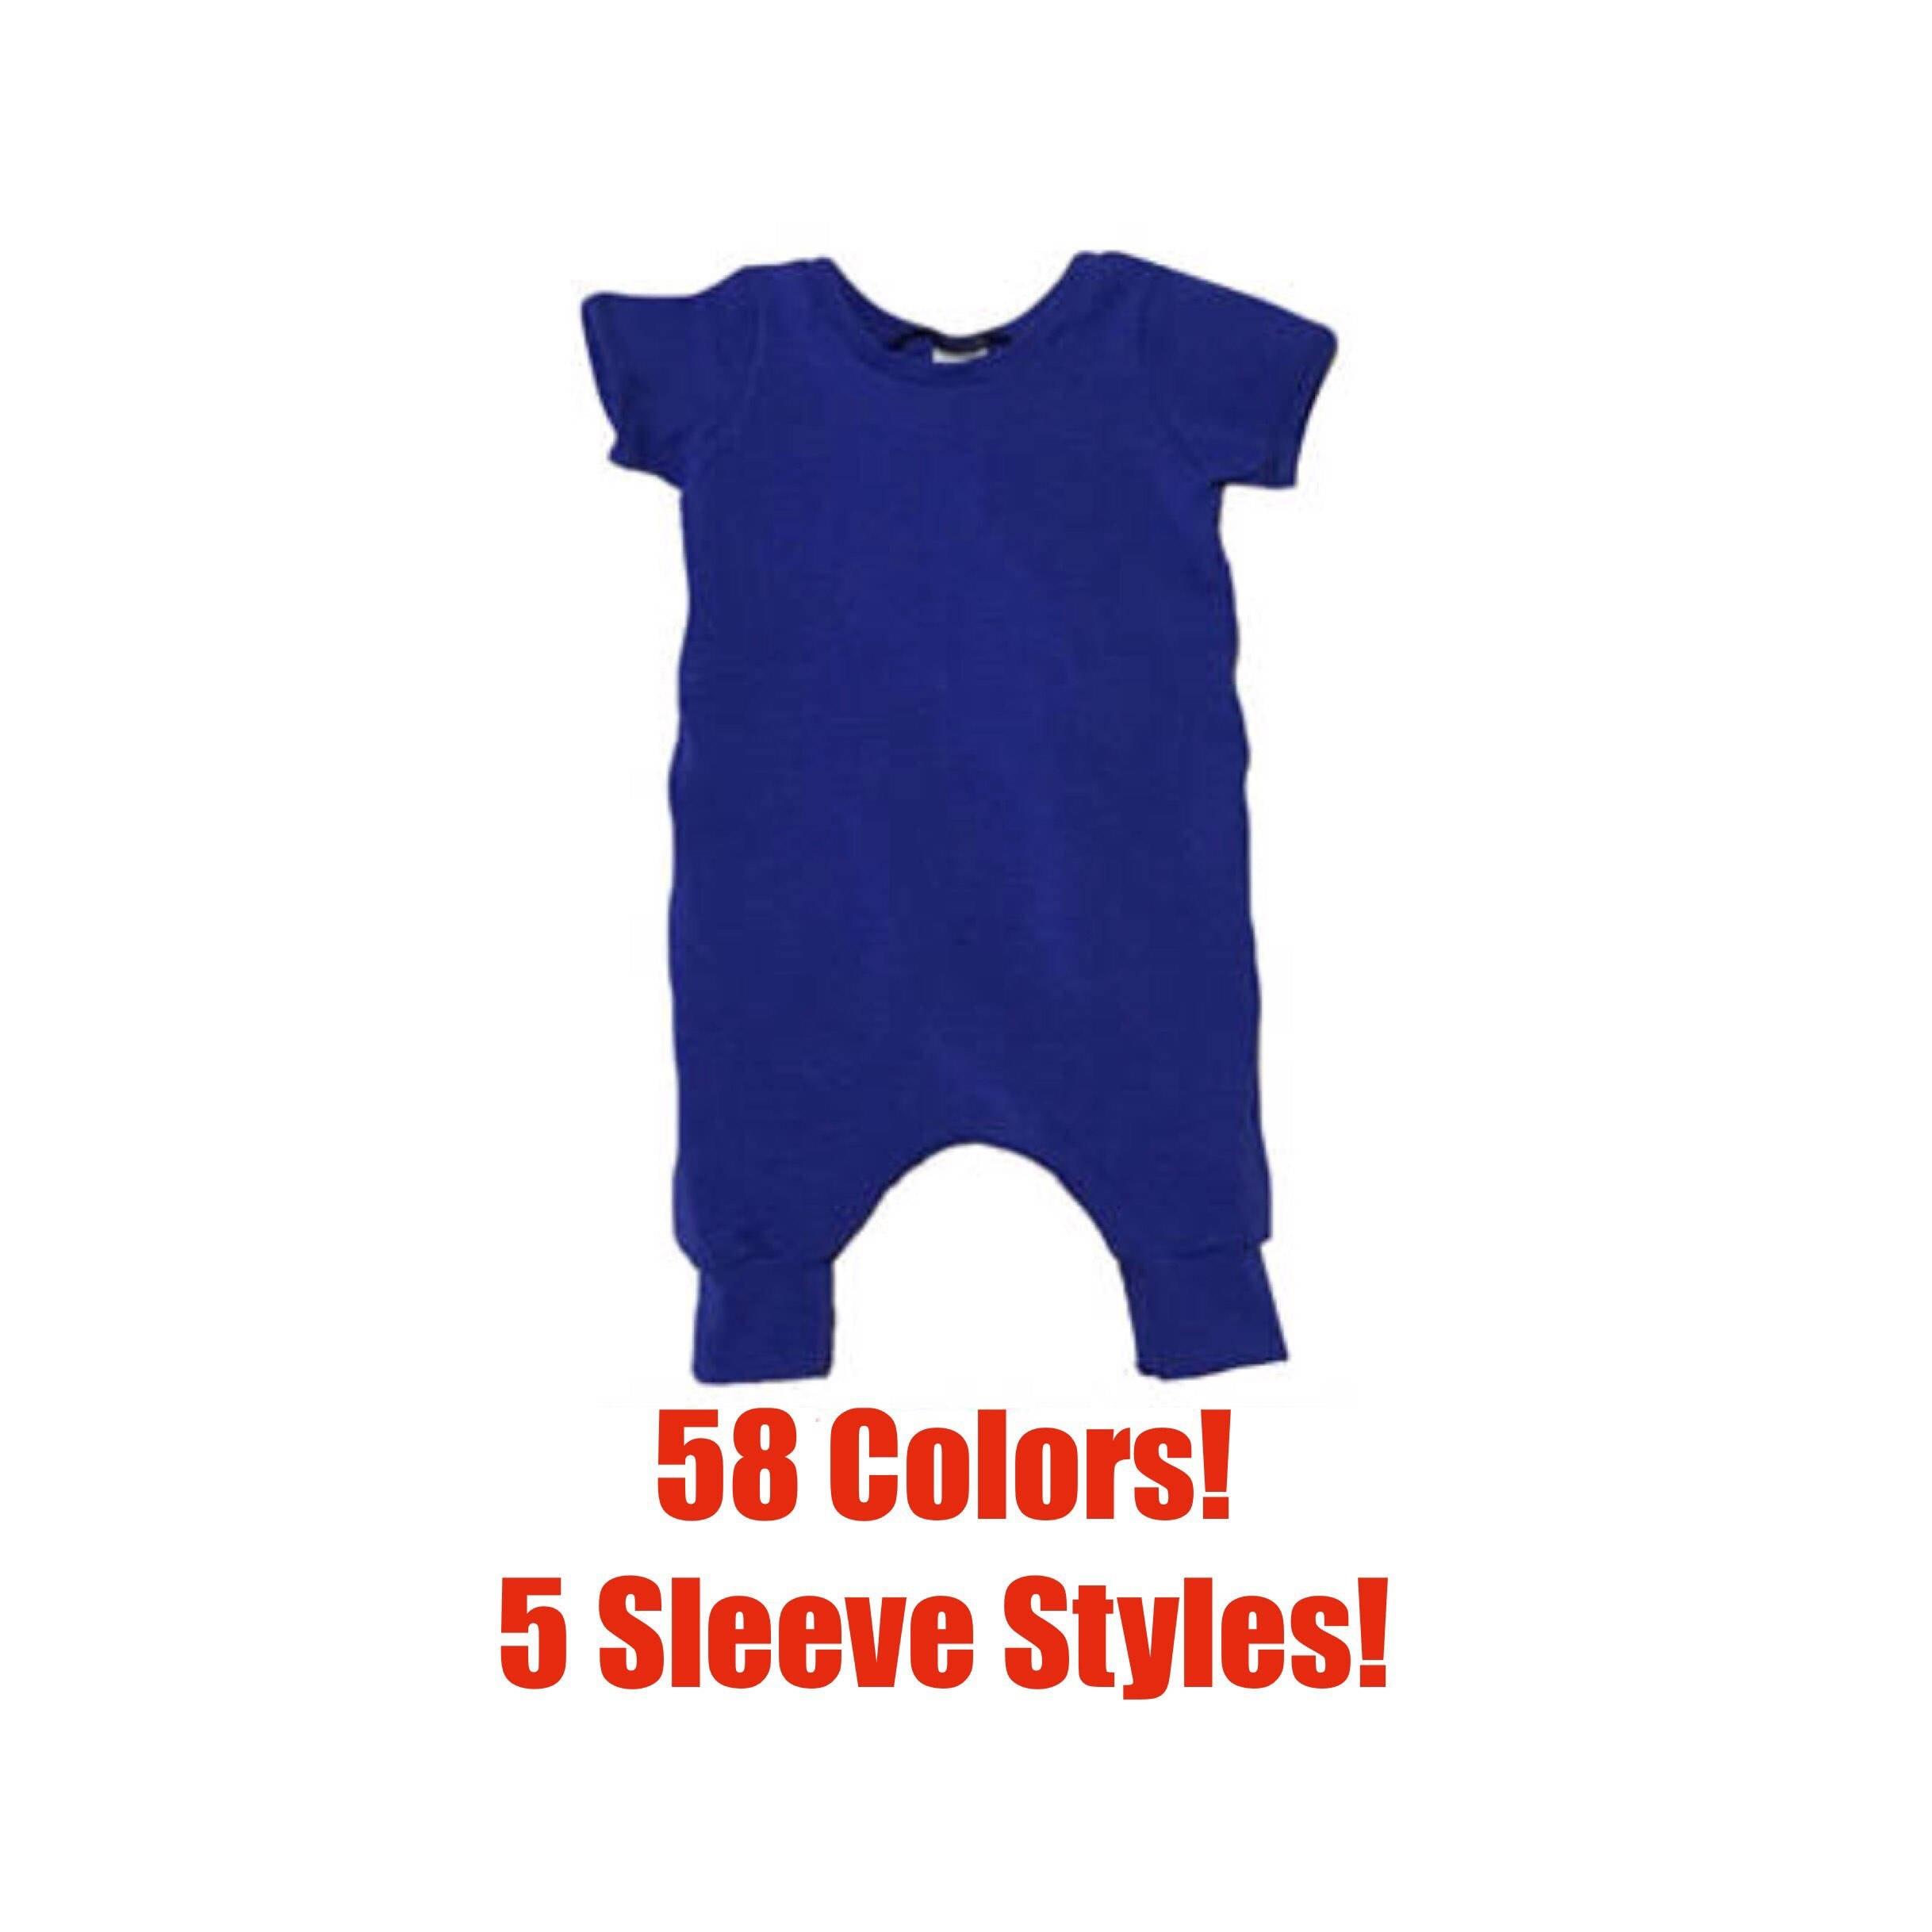 bbe0bc39f82f Solid Pant Romper Solid Romper Baby Romper Toddler Romper